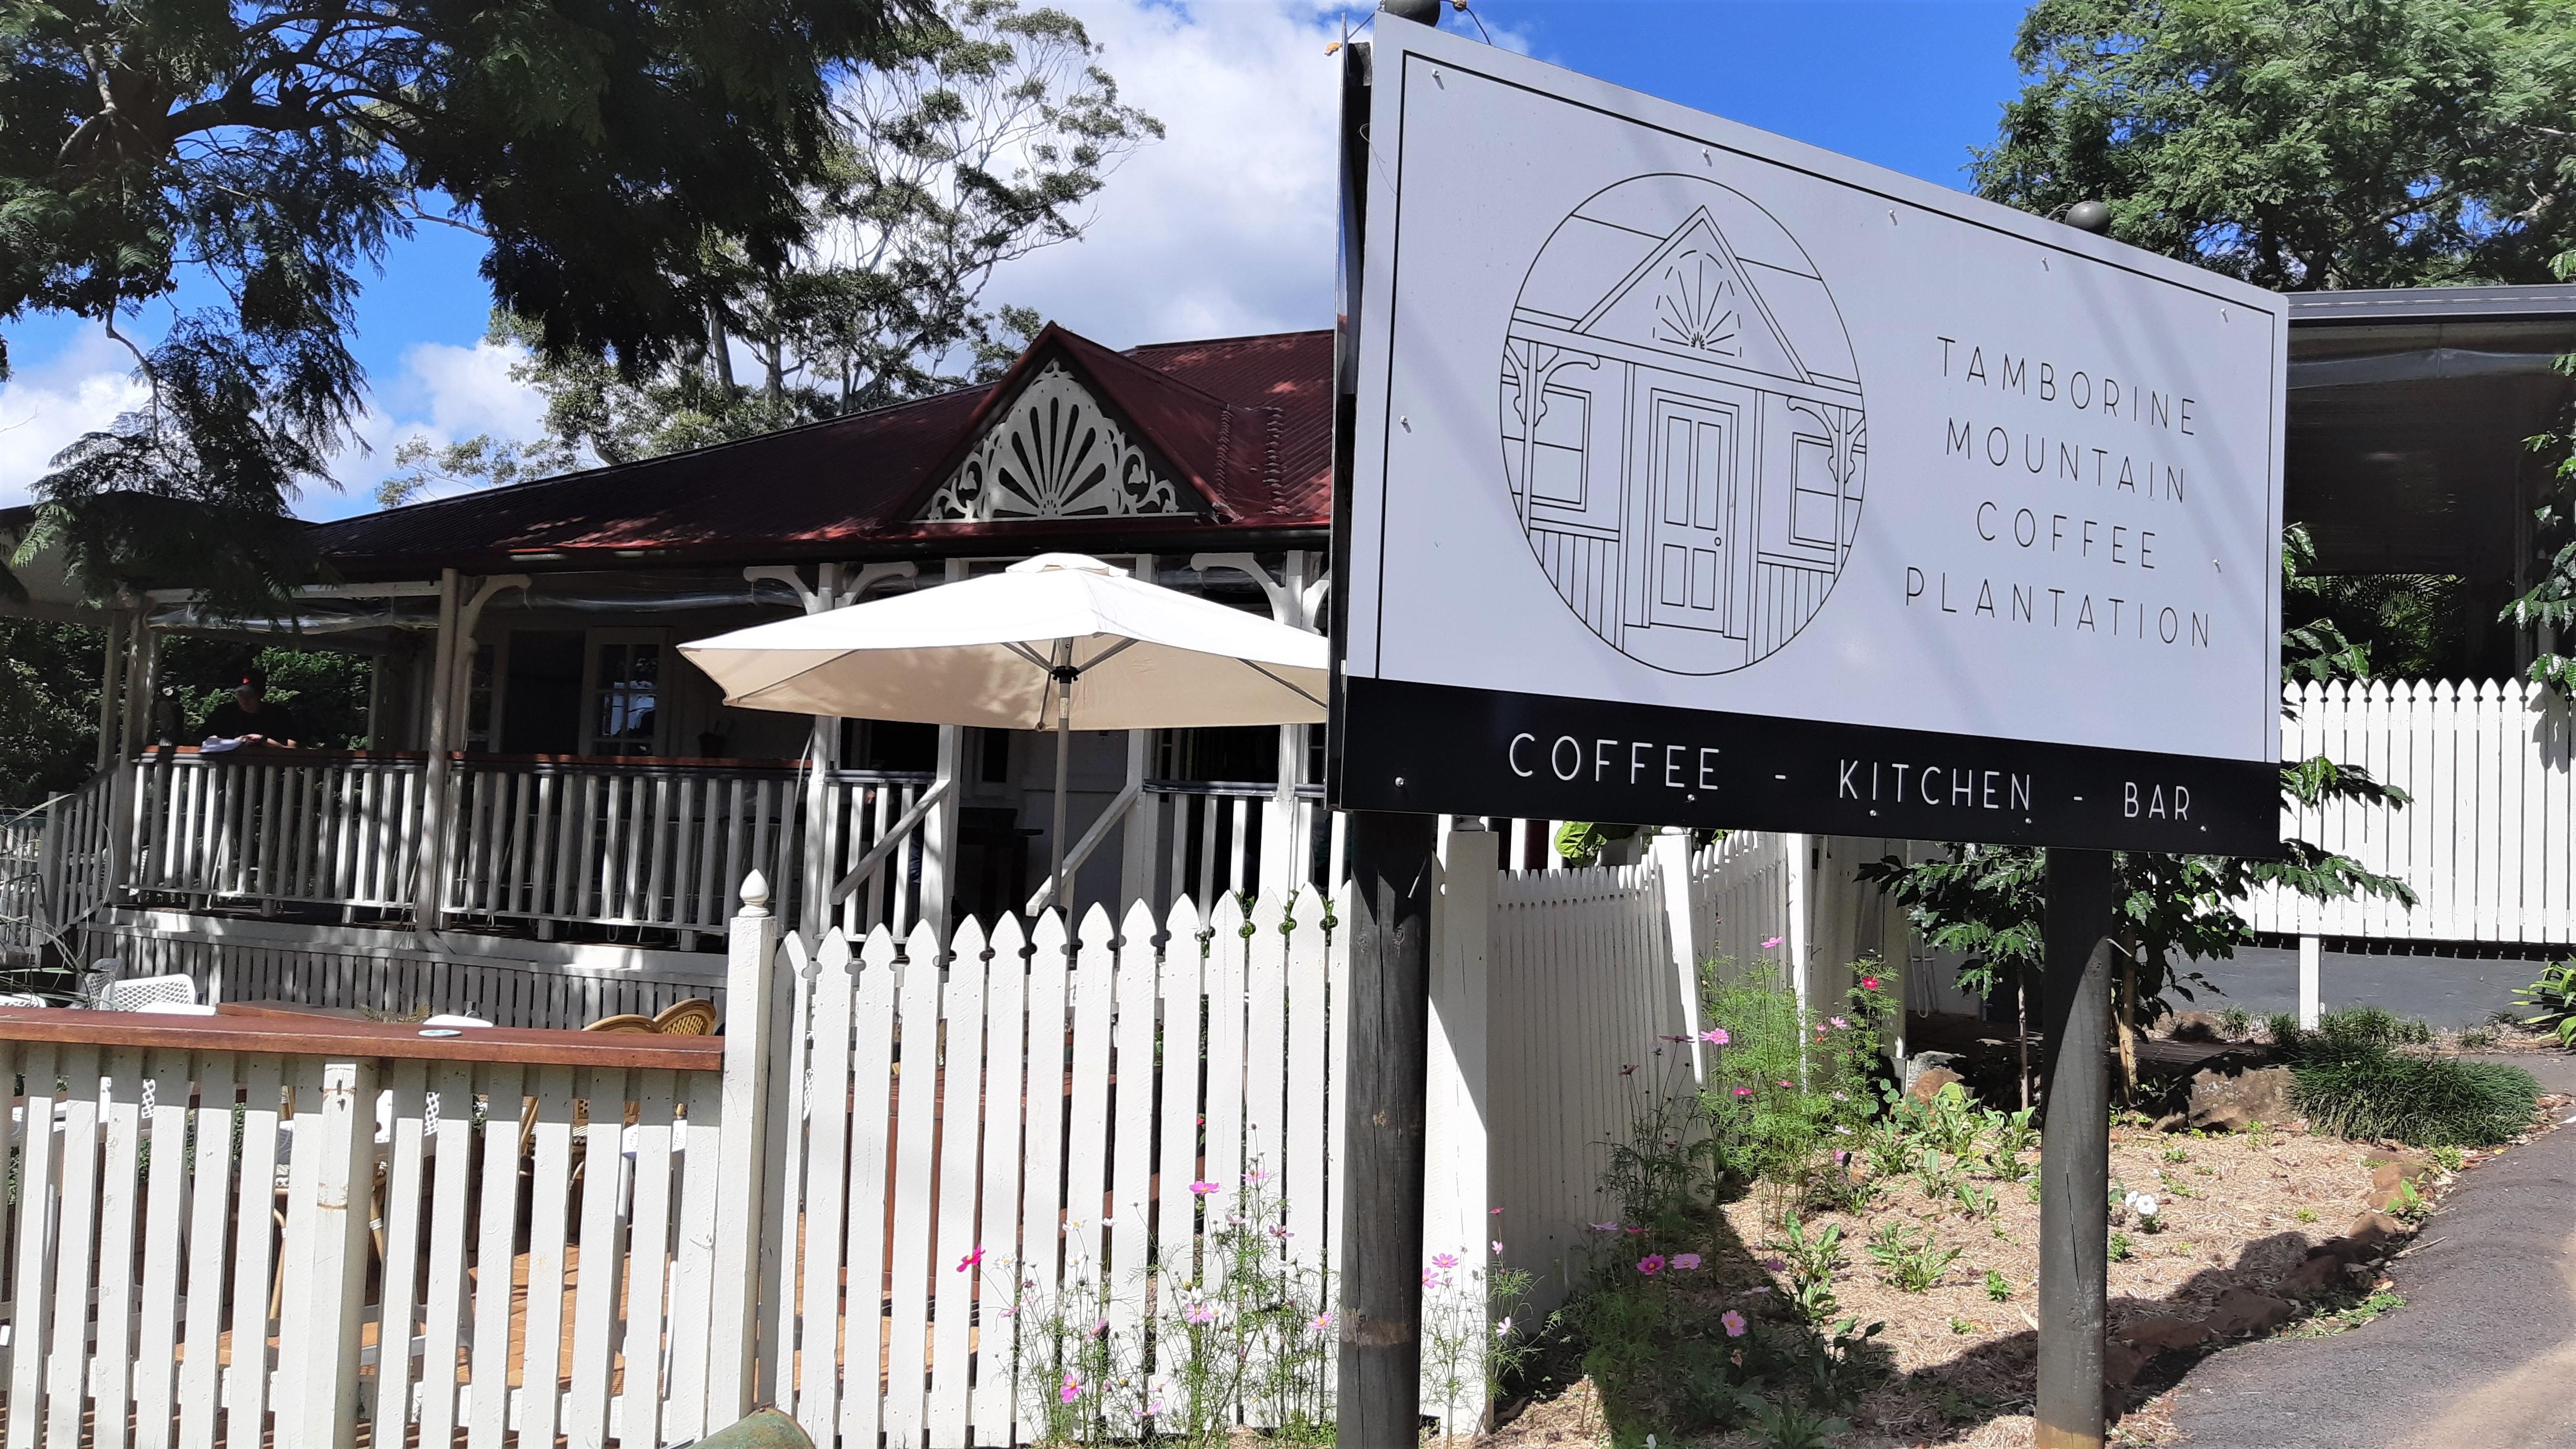 Tamborine Mountain Coffee Plantation